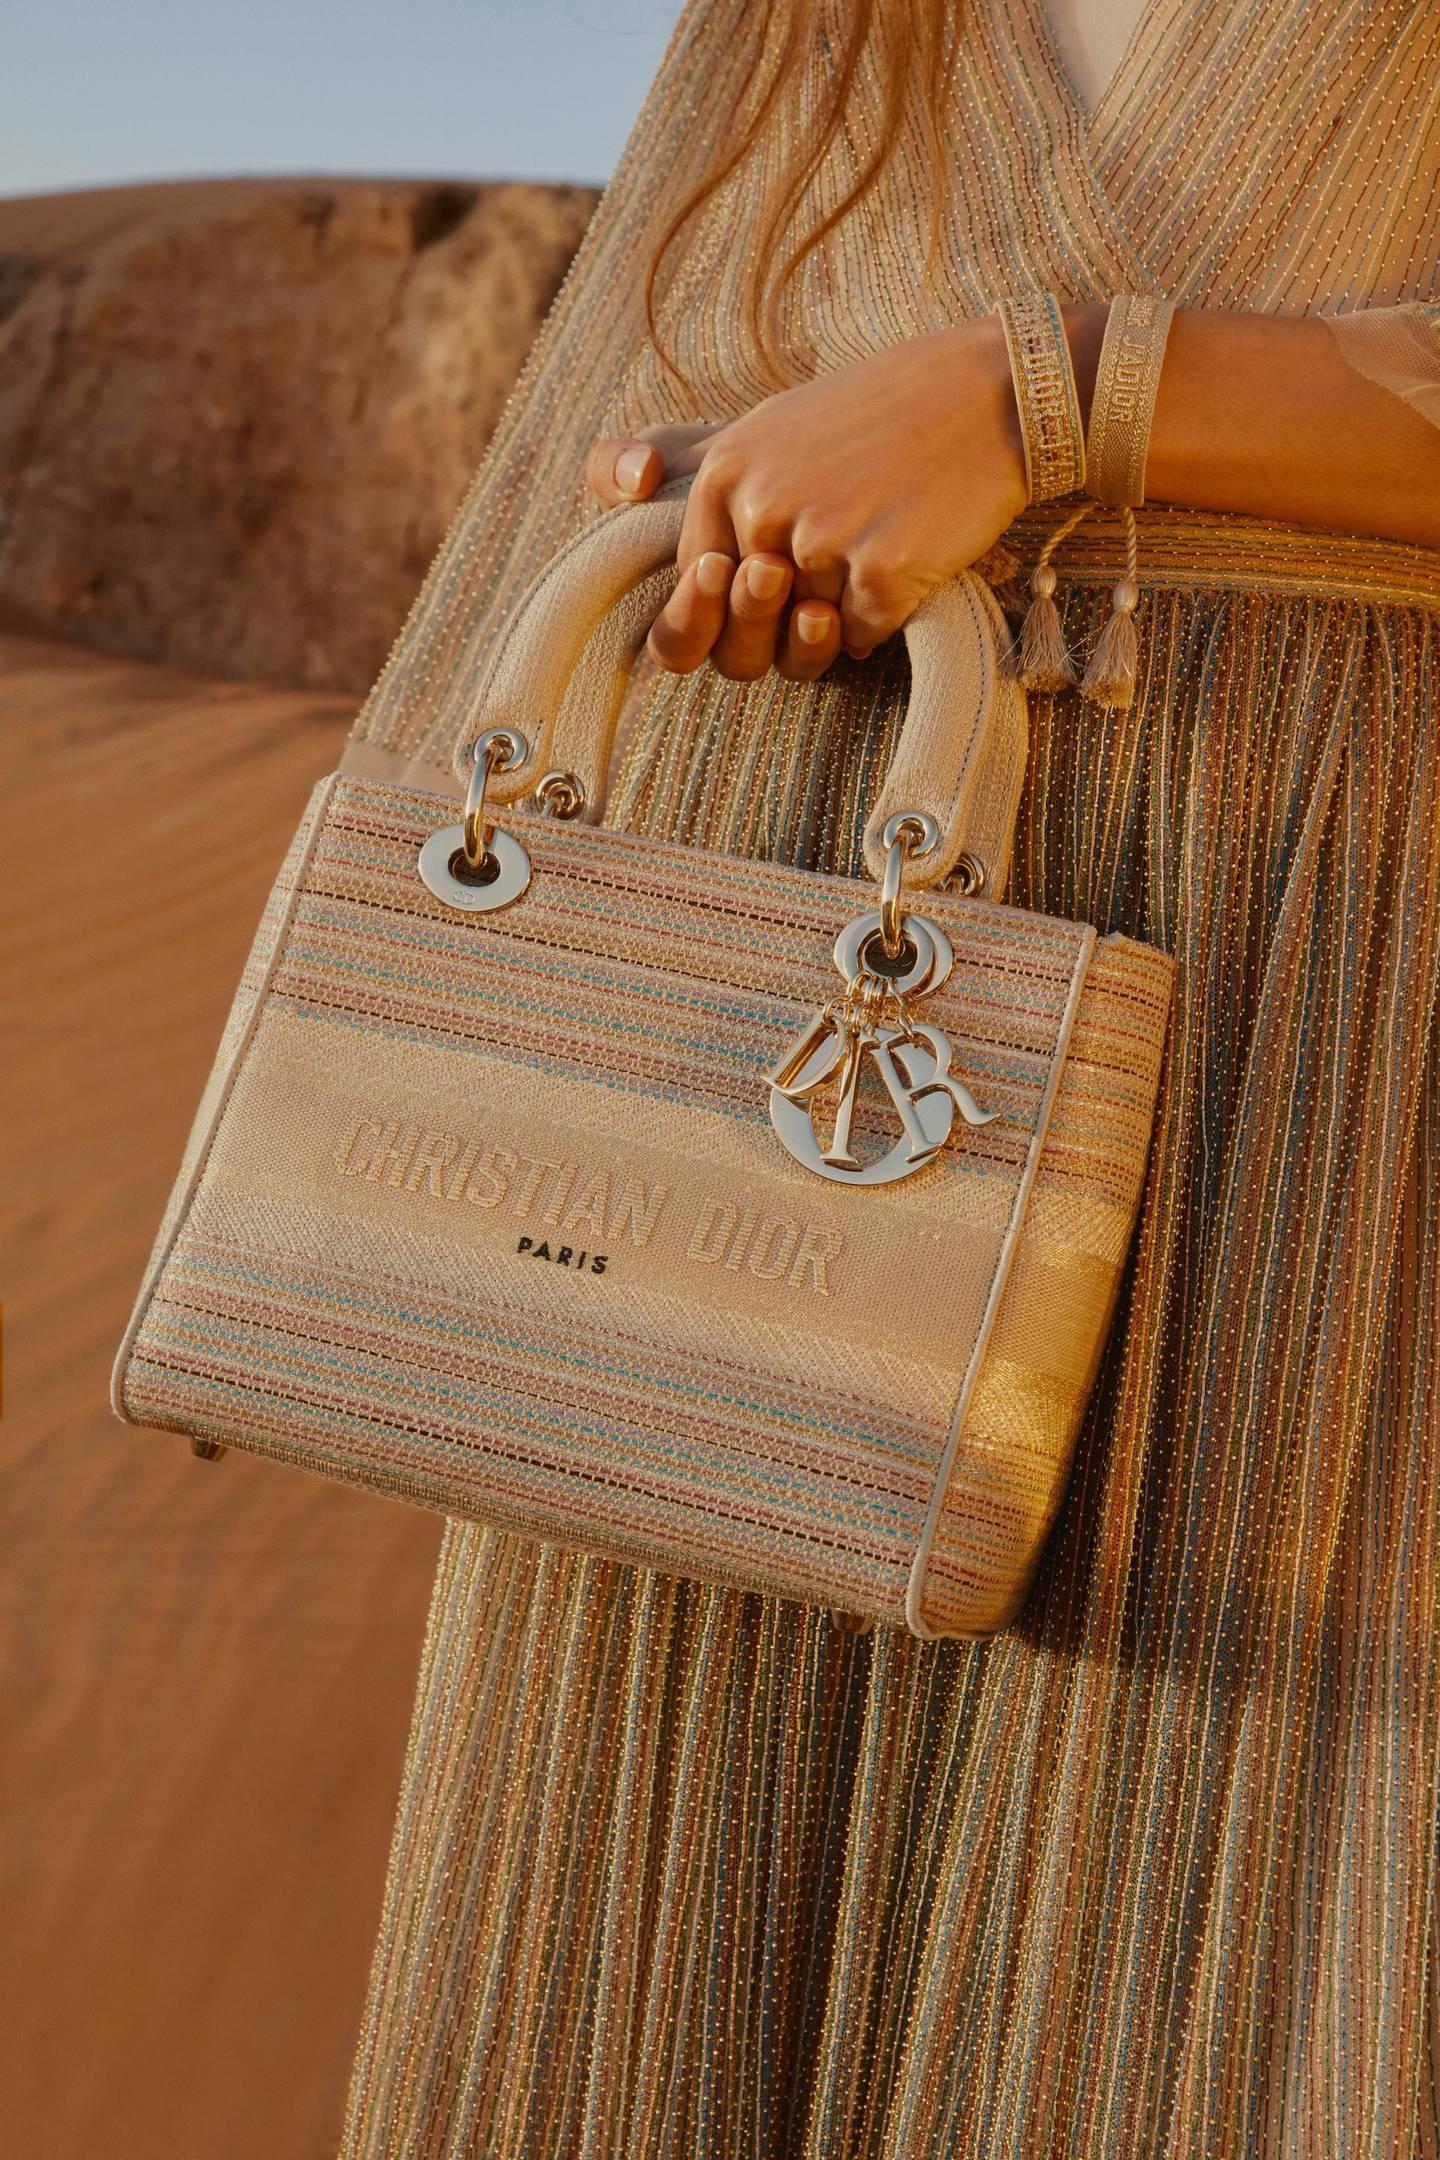 The Dior Gold capsule collection. Courtesy MazenAbusrour